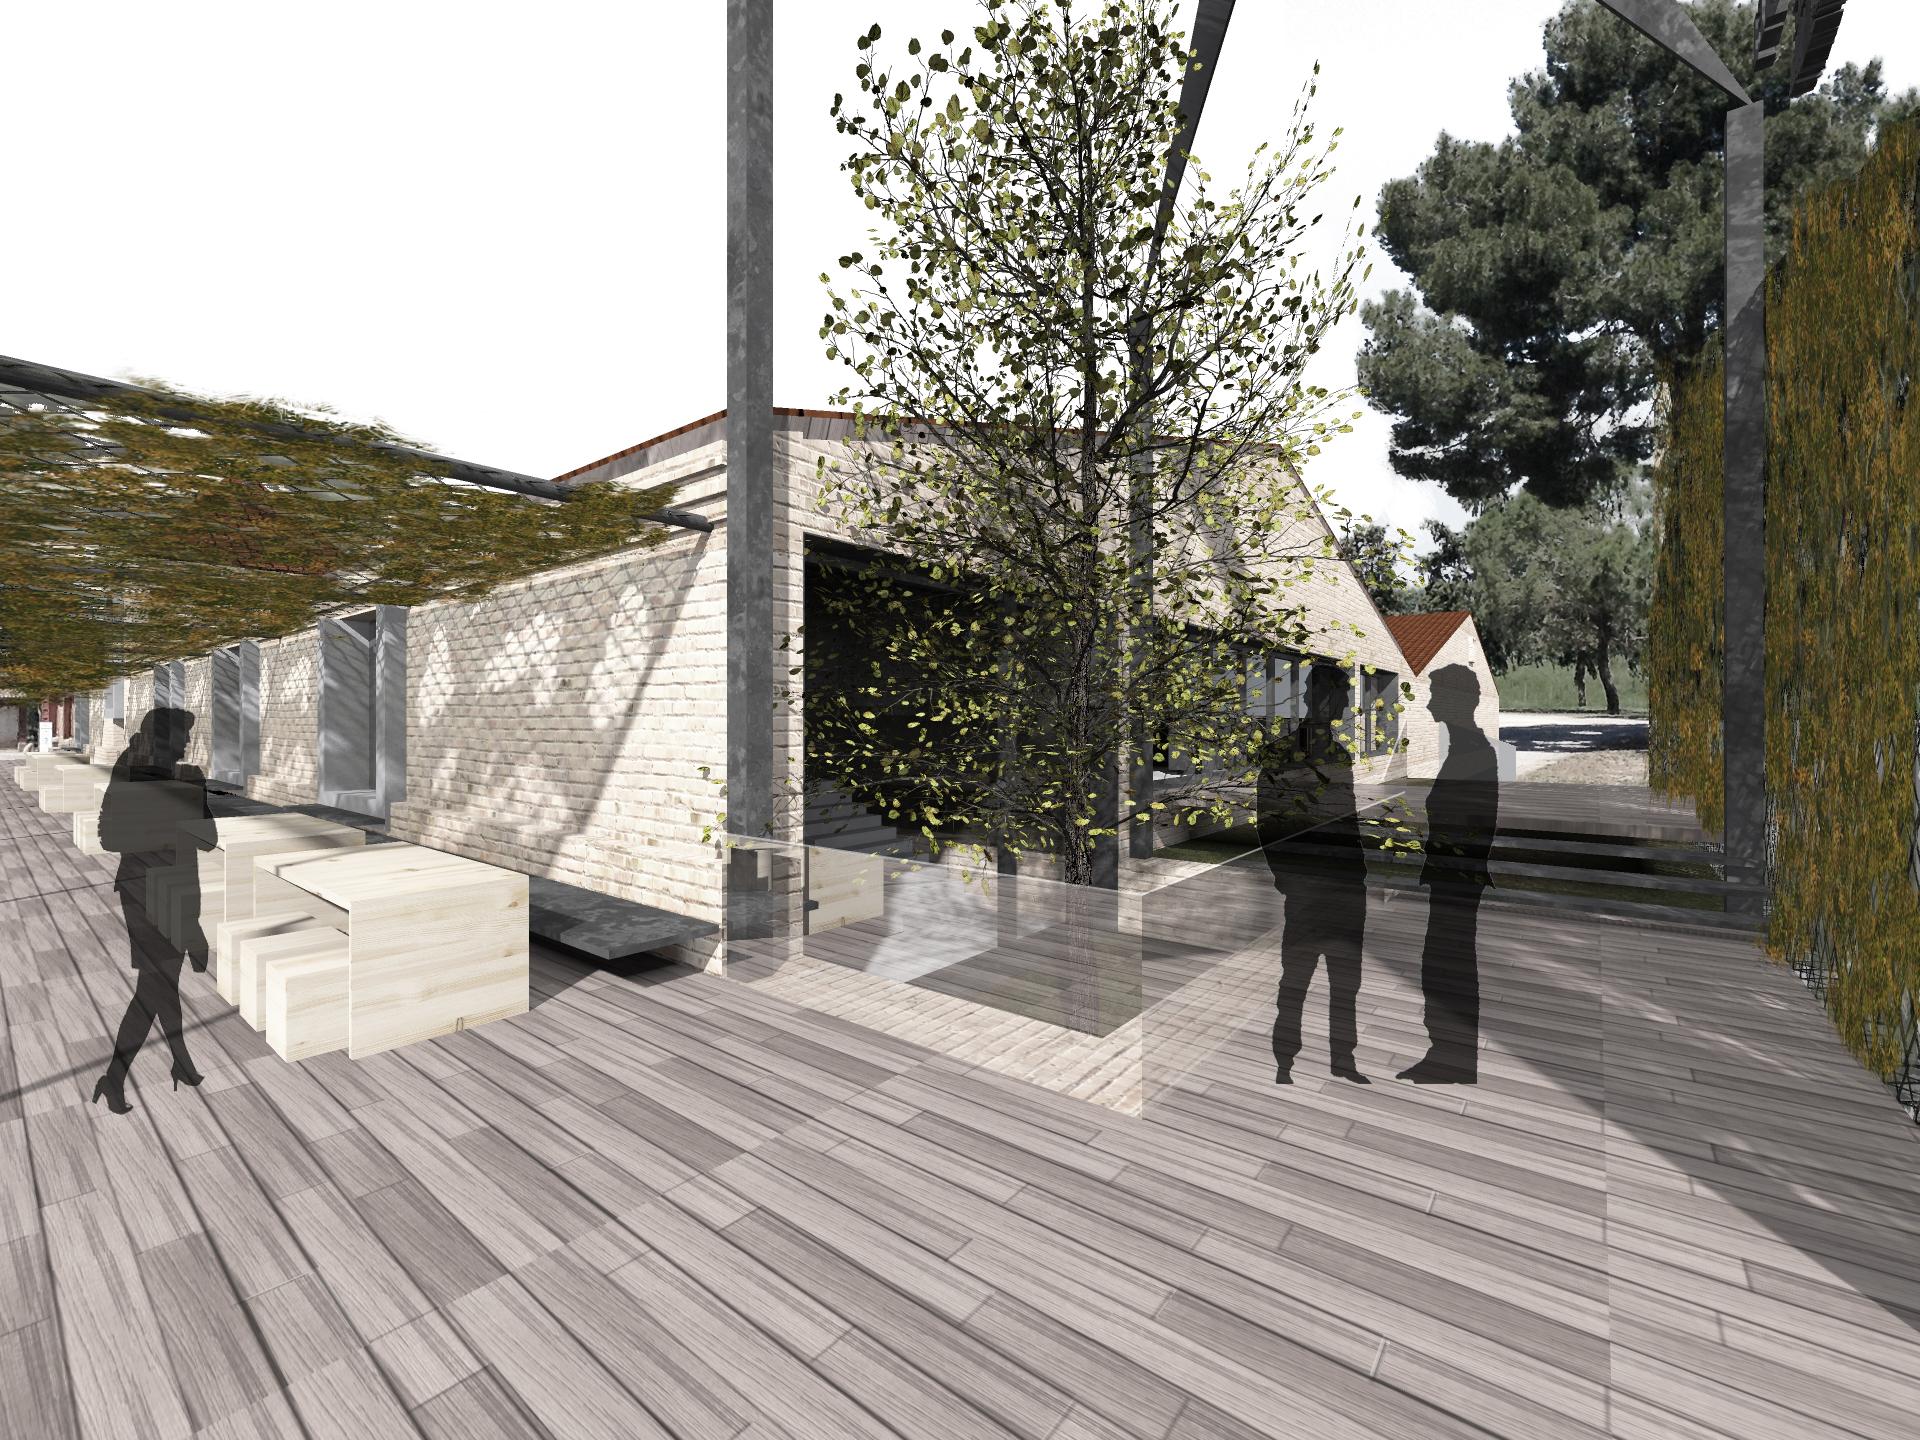 Sala Ferusic Architects The Castle Carles Sala Relja Ferusic